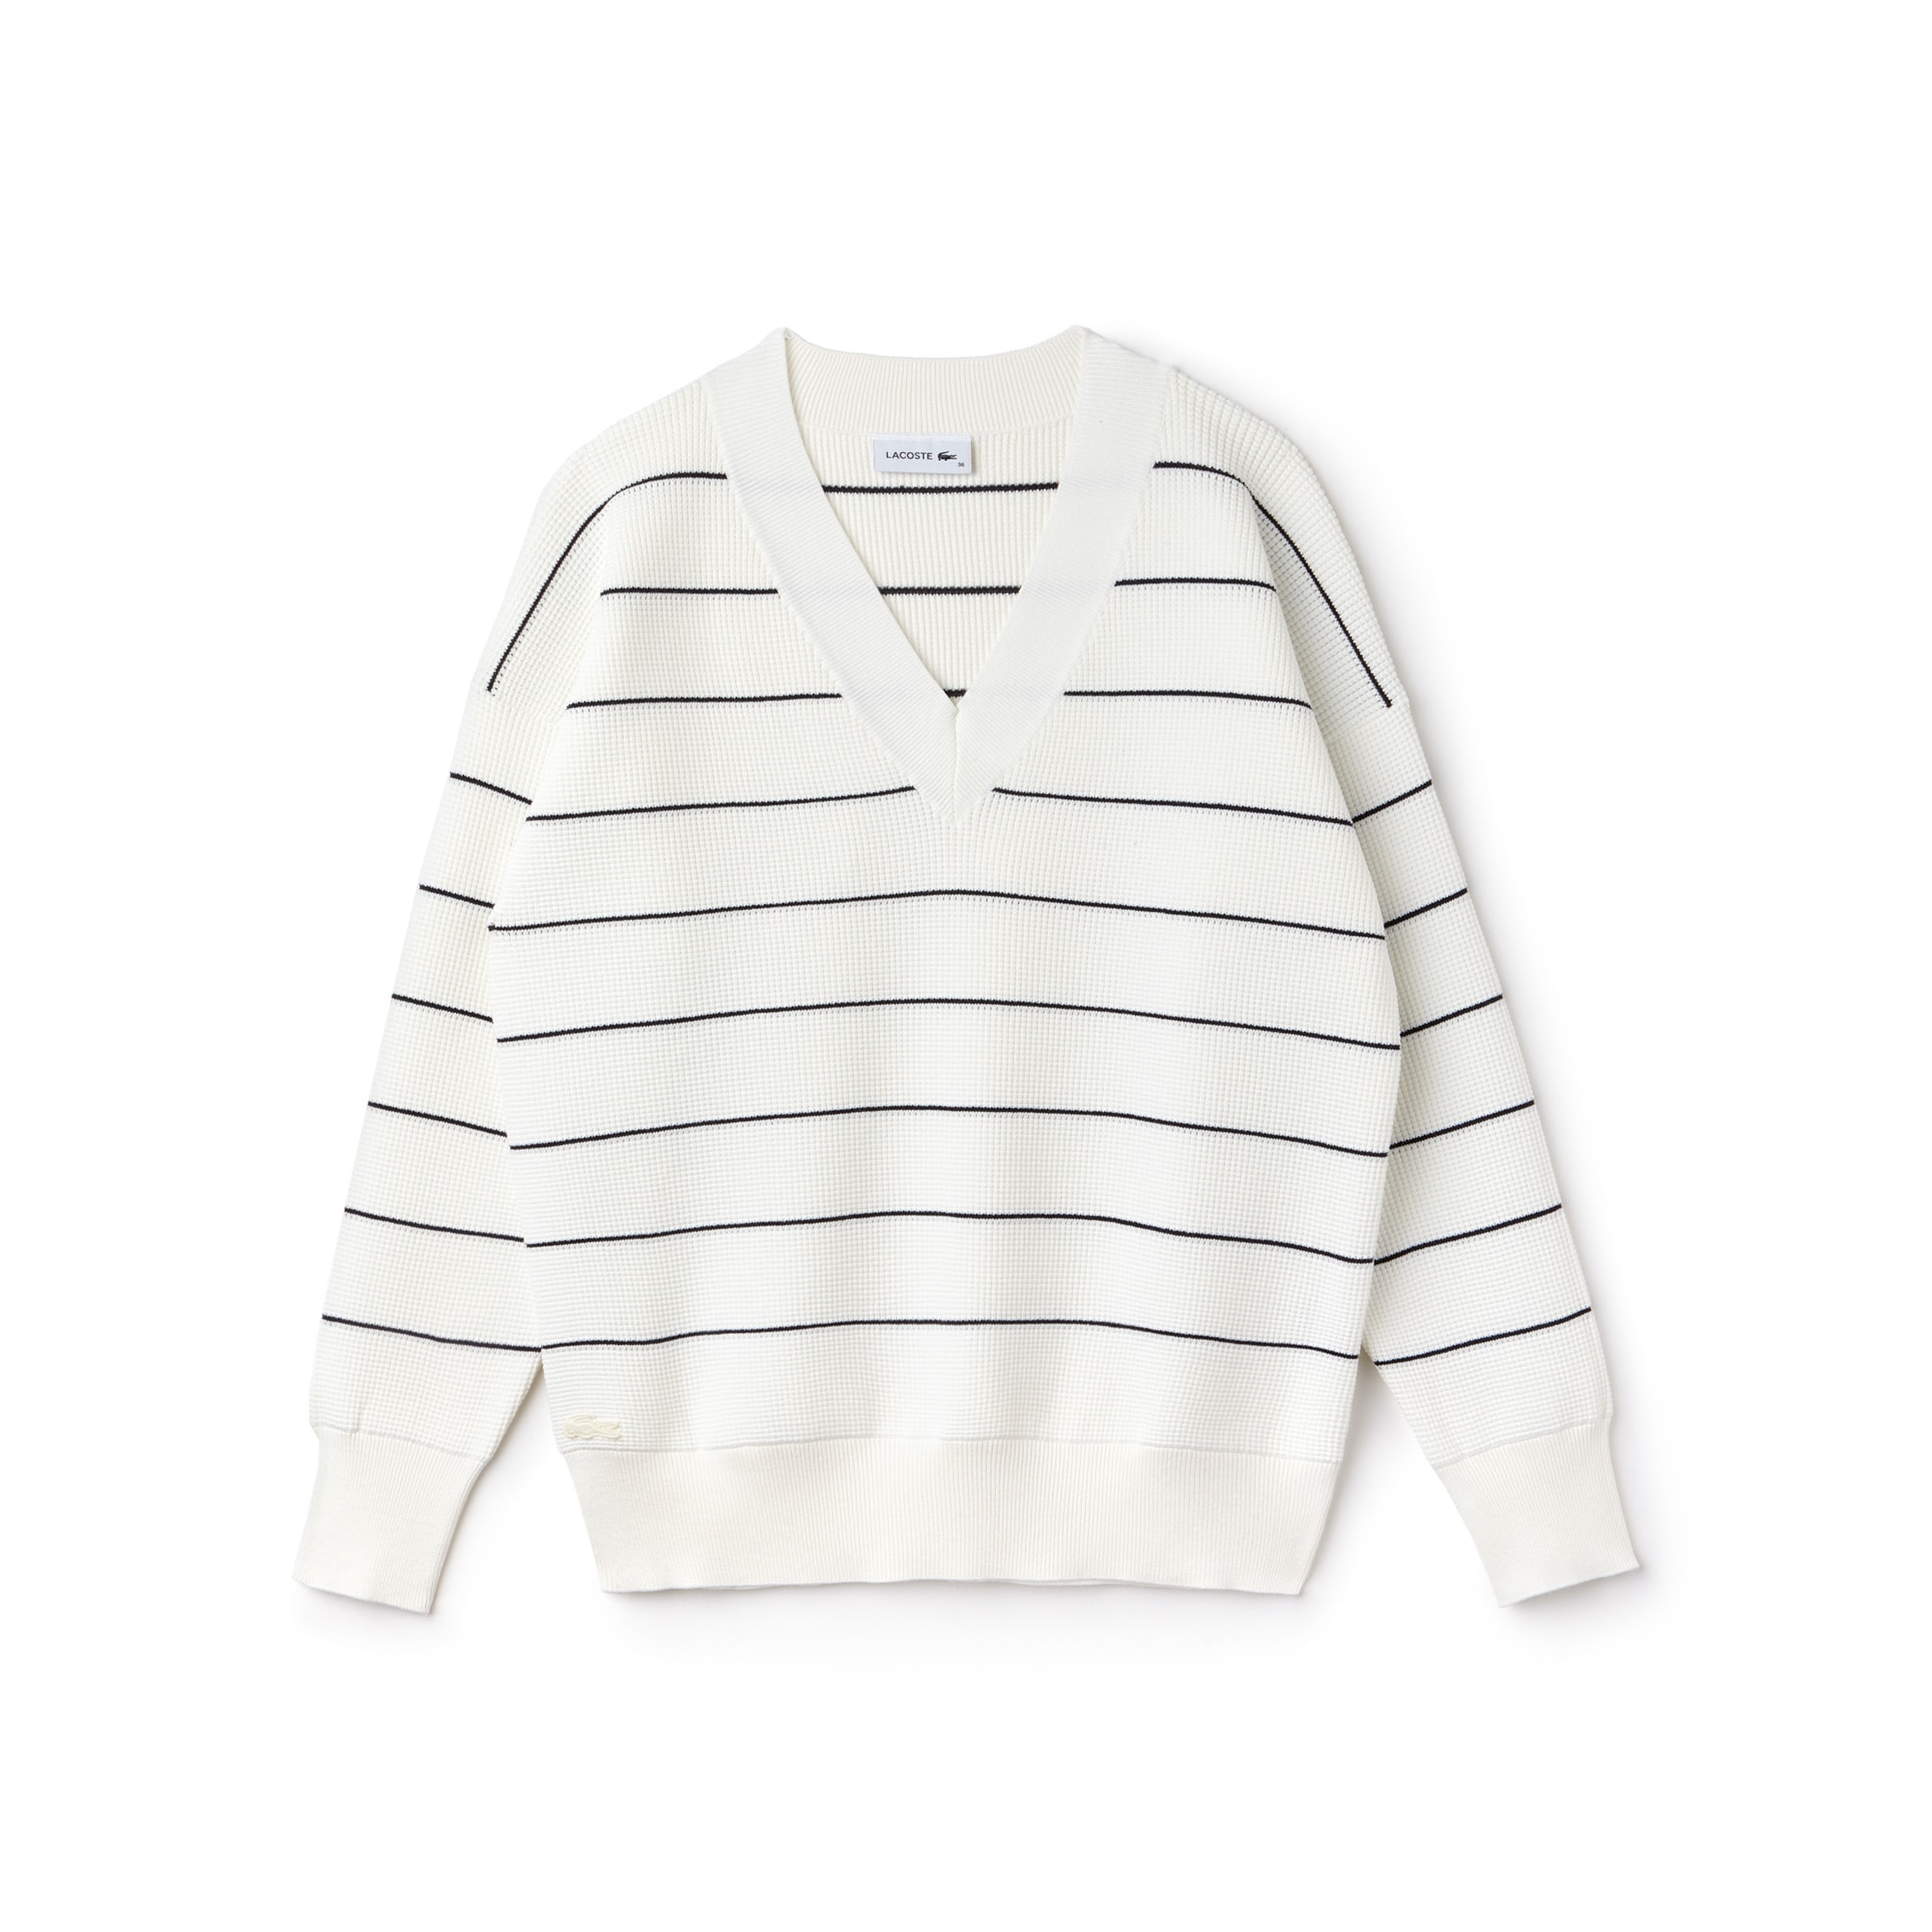 Women's V-neck Striped Honeycomb Knit Sweater